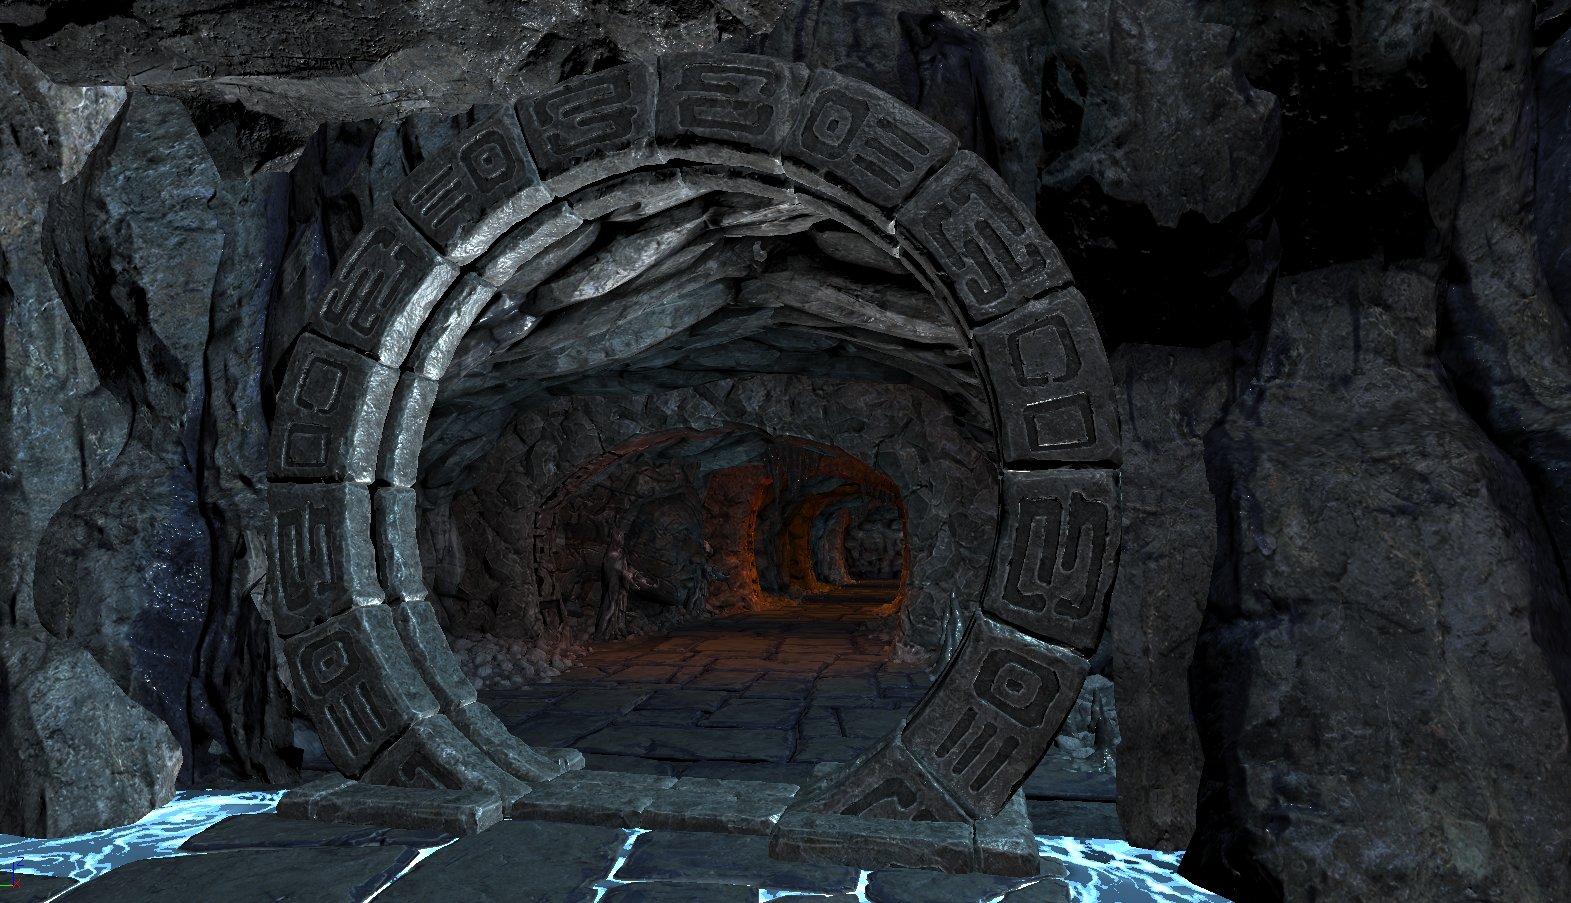 Dennis glowacki circledoor